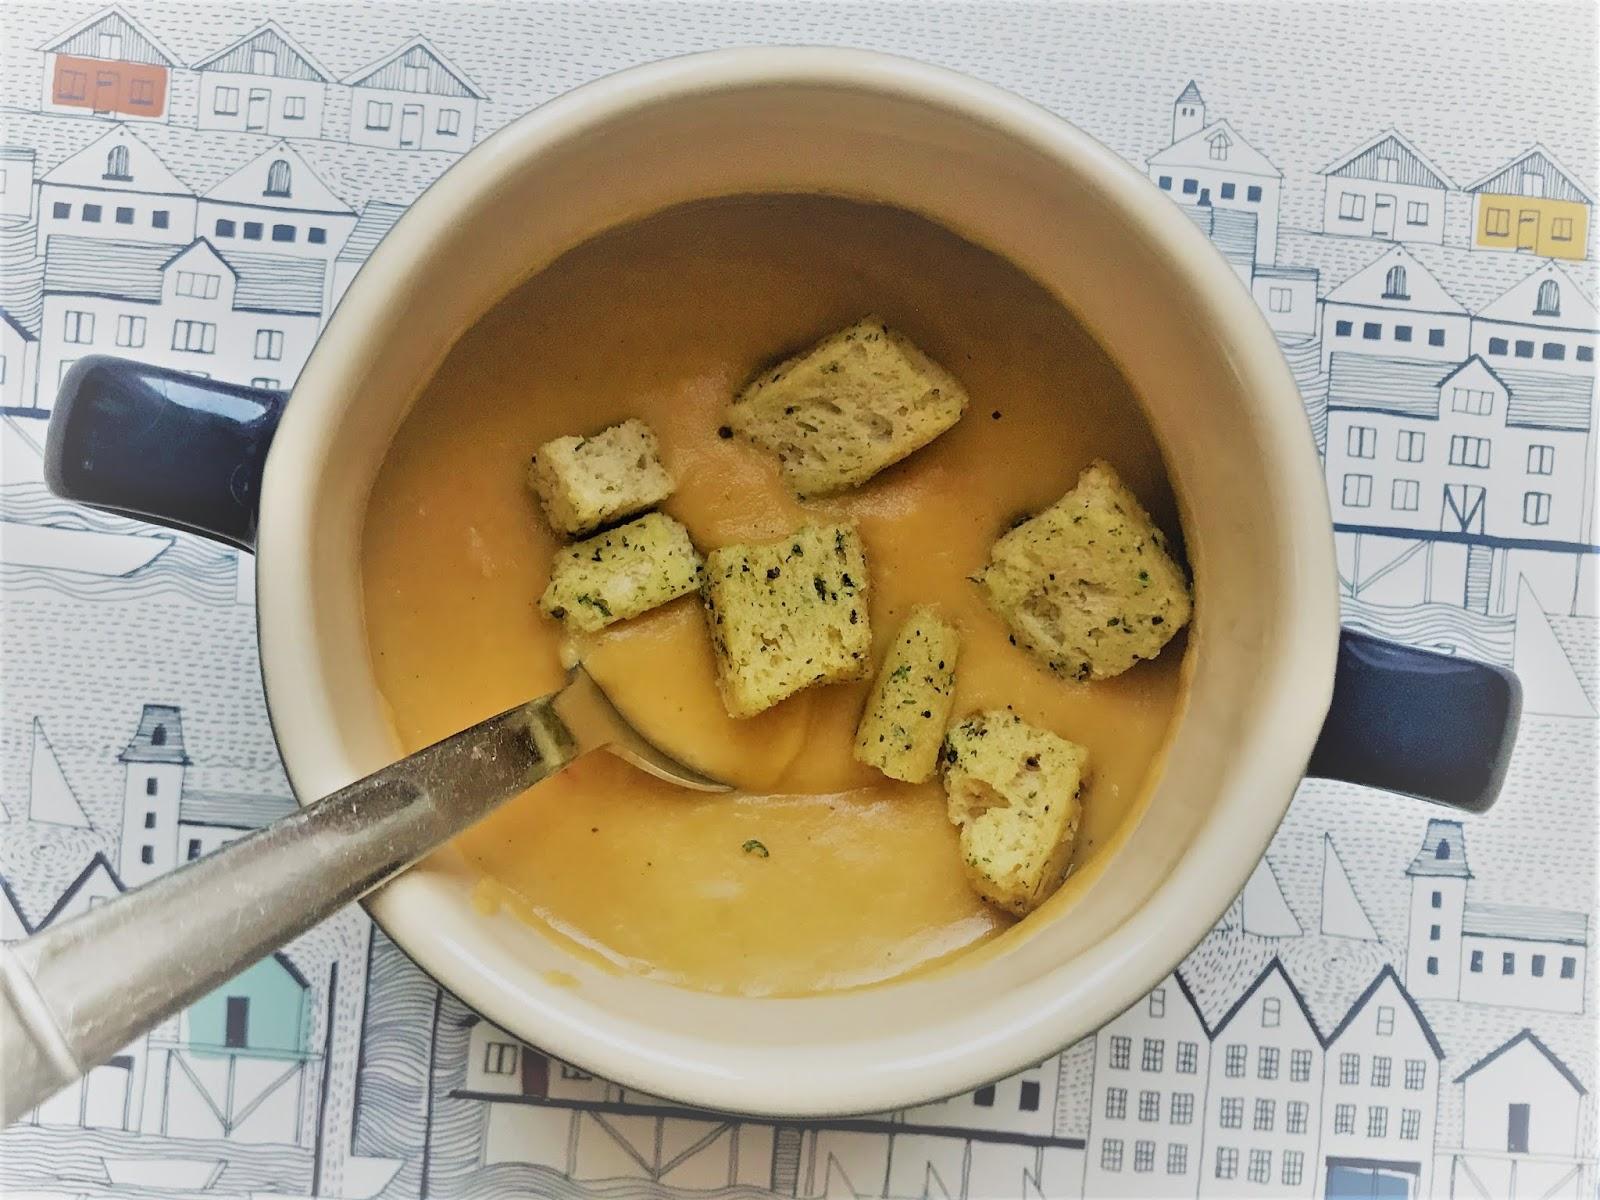 Maggie's Parsnip & Sweet Potato Soup